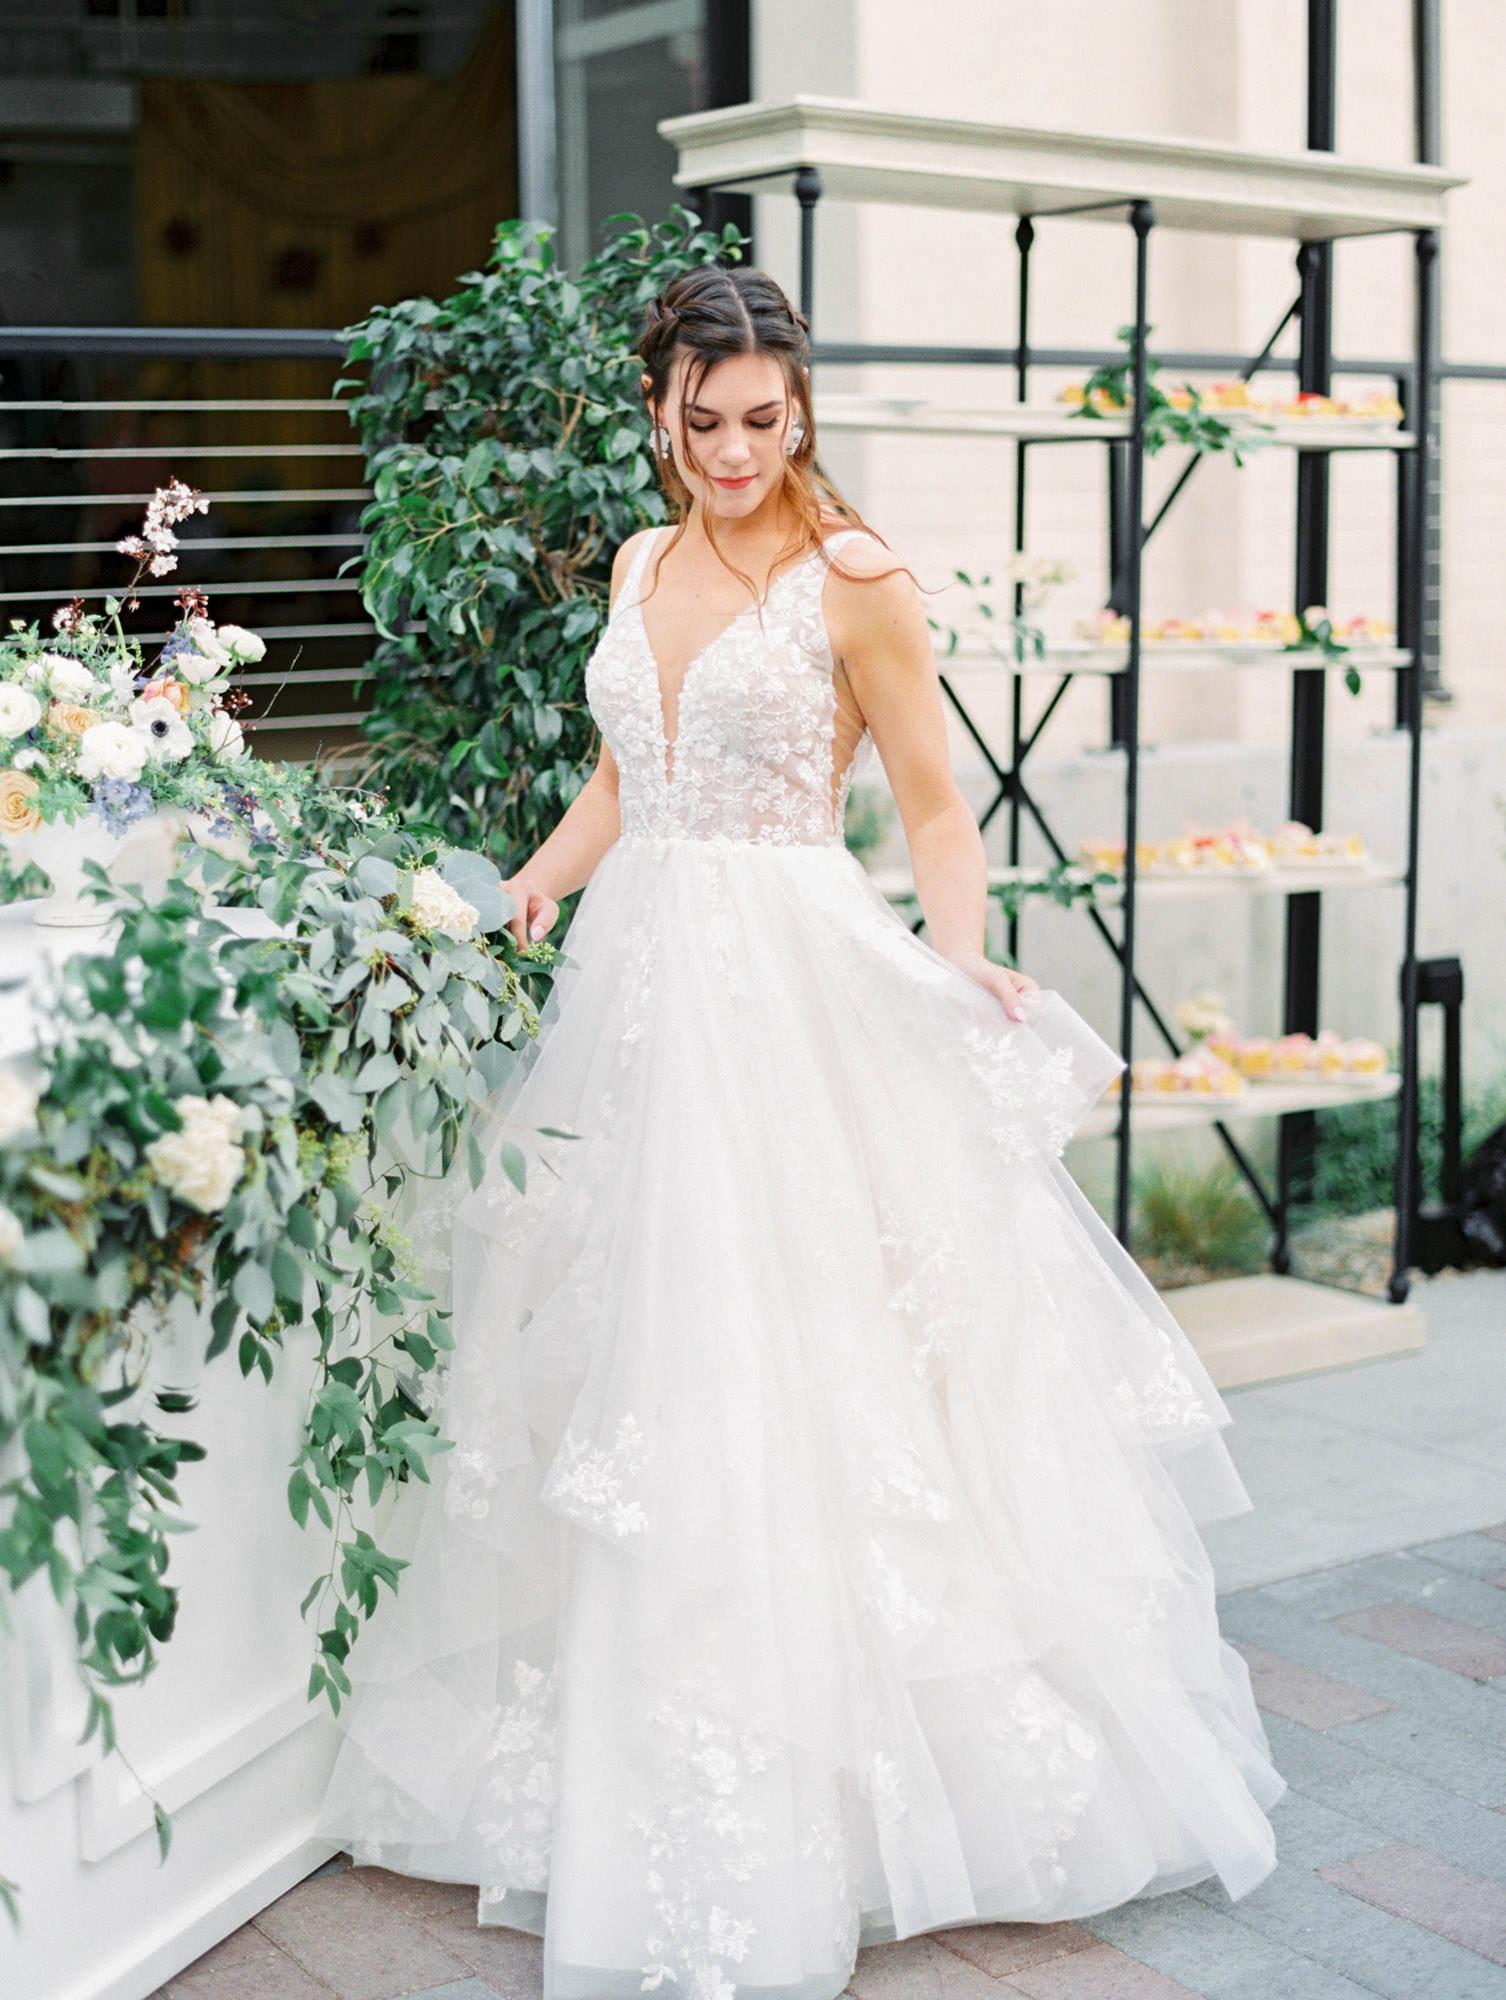 1105 sleeveless ballgown with floral lace Martina Liana wedding dress in San Diego by Cavin Elizabeth - San Diego film photographer. Wedding Fashion Inspiration.